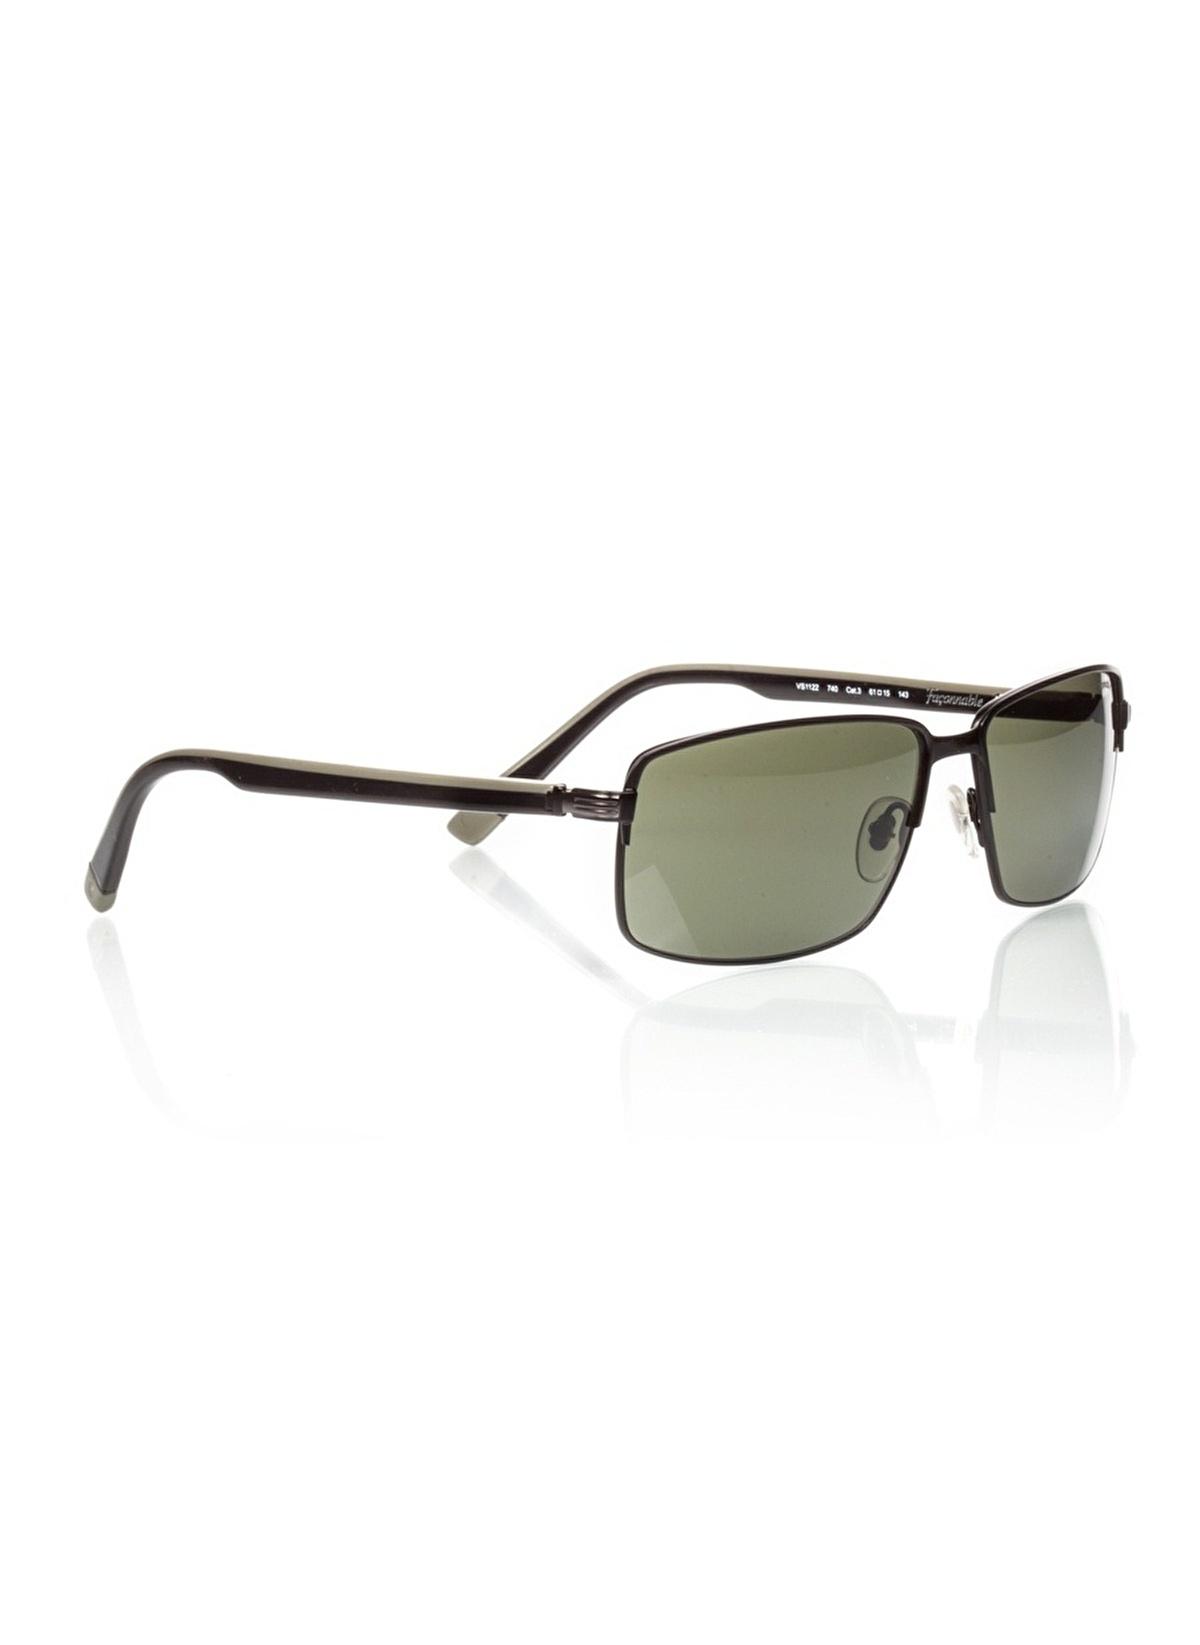 Façonnable Güneş Gözlüğü F 1122 740 Güneş Gözlüğü – 622.16 TL